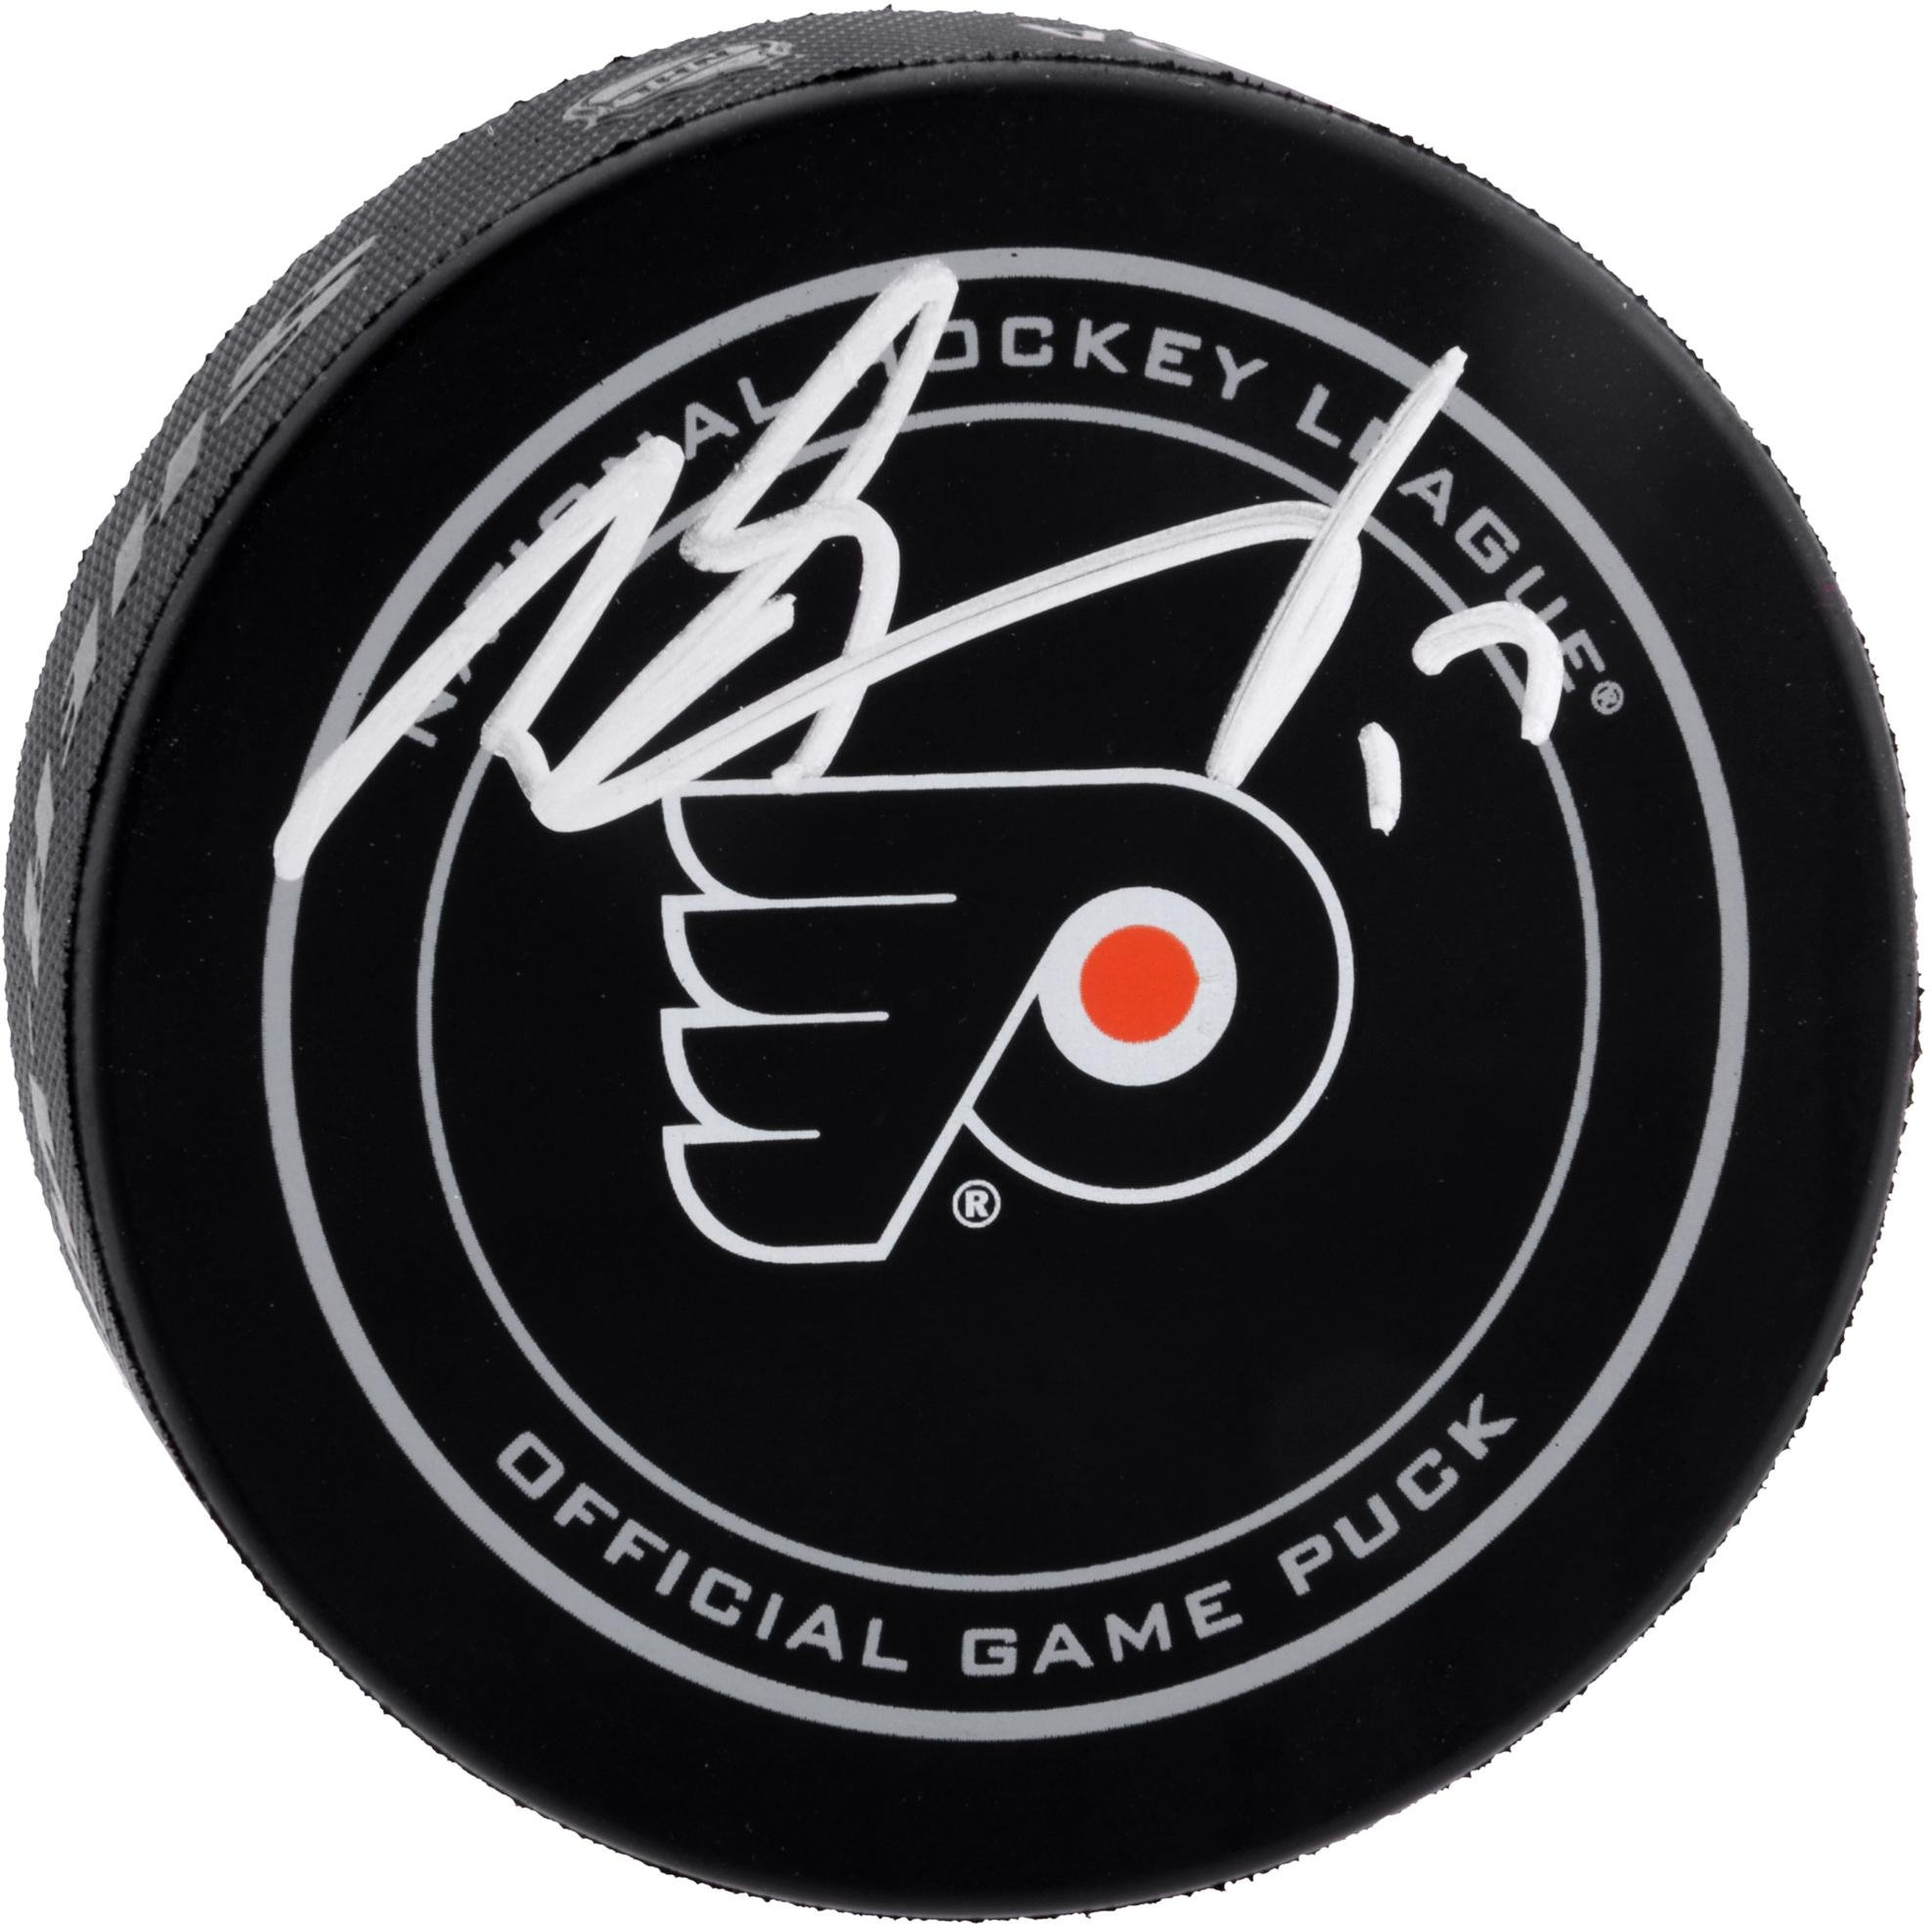 Wayne Simmonds Philadelphia Flyers Autographed Official Game Puck Fanatics Authentic Certified Autographed NHL Pucks